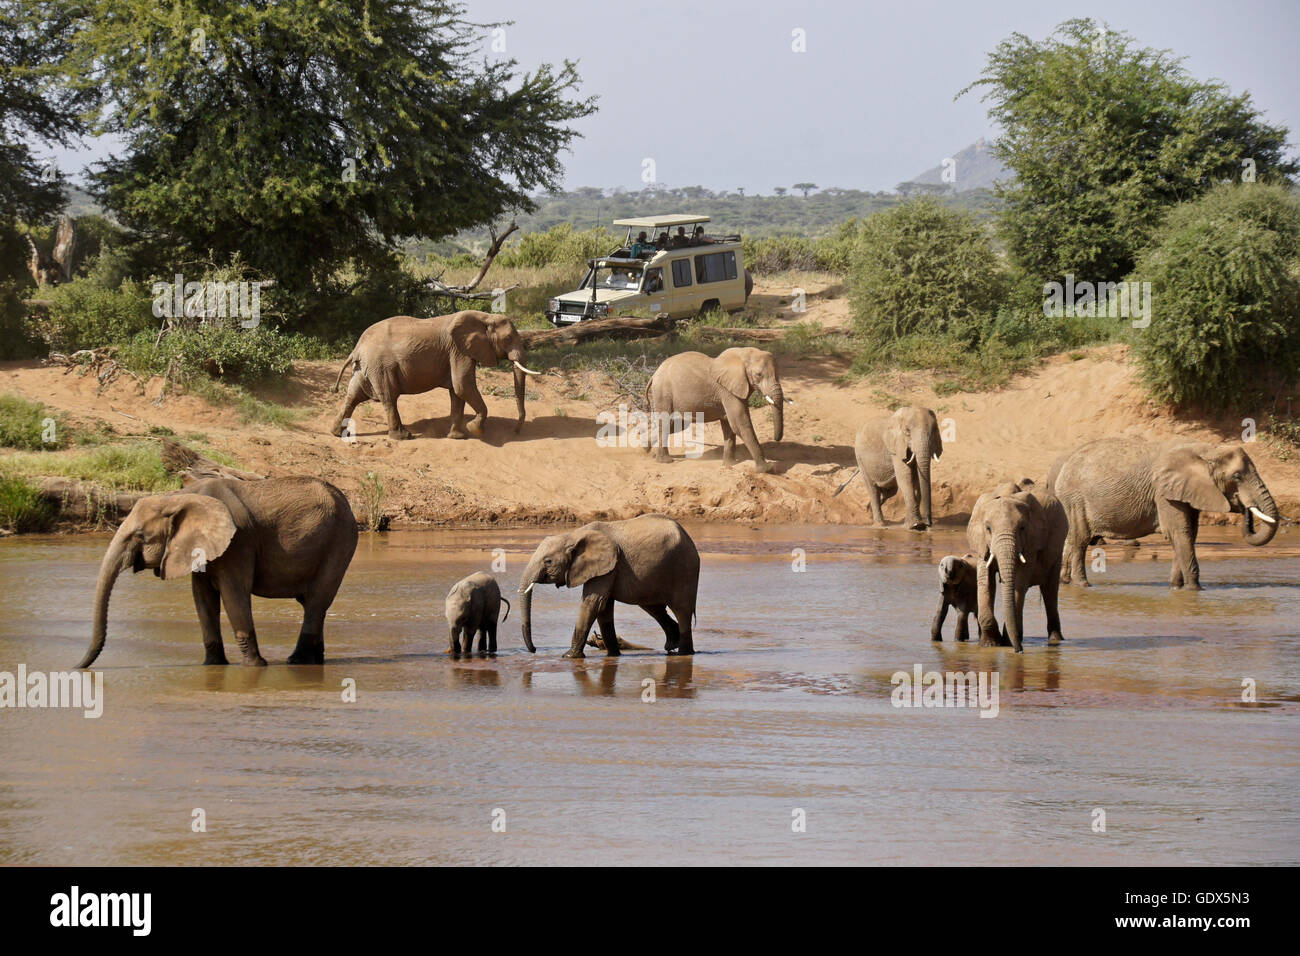 Safari vehicle and elephants at Ewaso (Uaso) Nyiro River, Samburu, Kenya - Stock Image